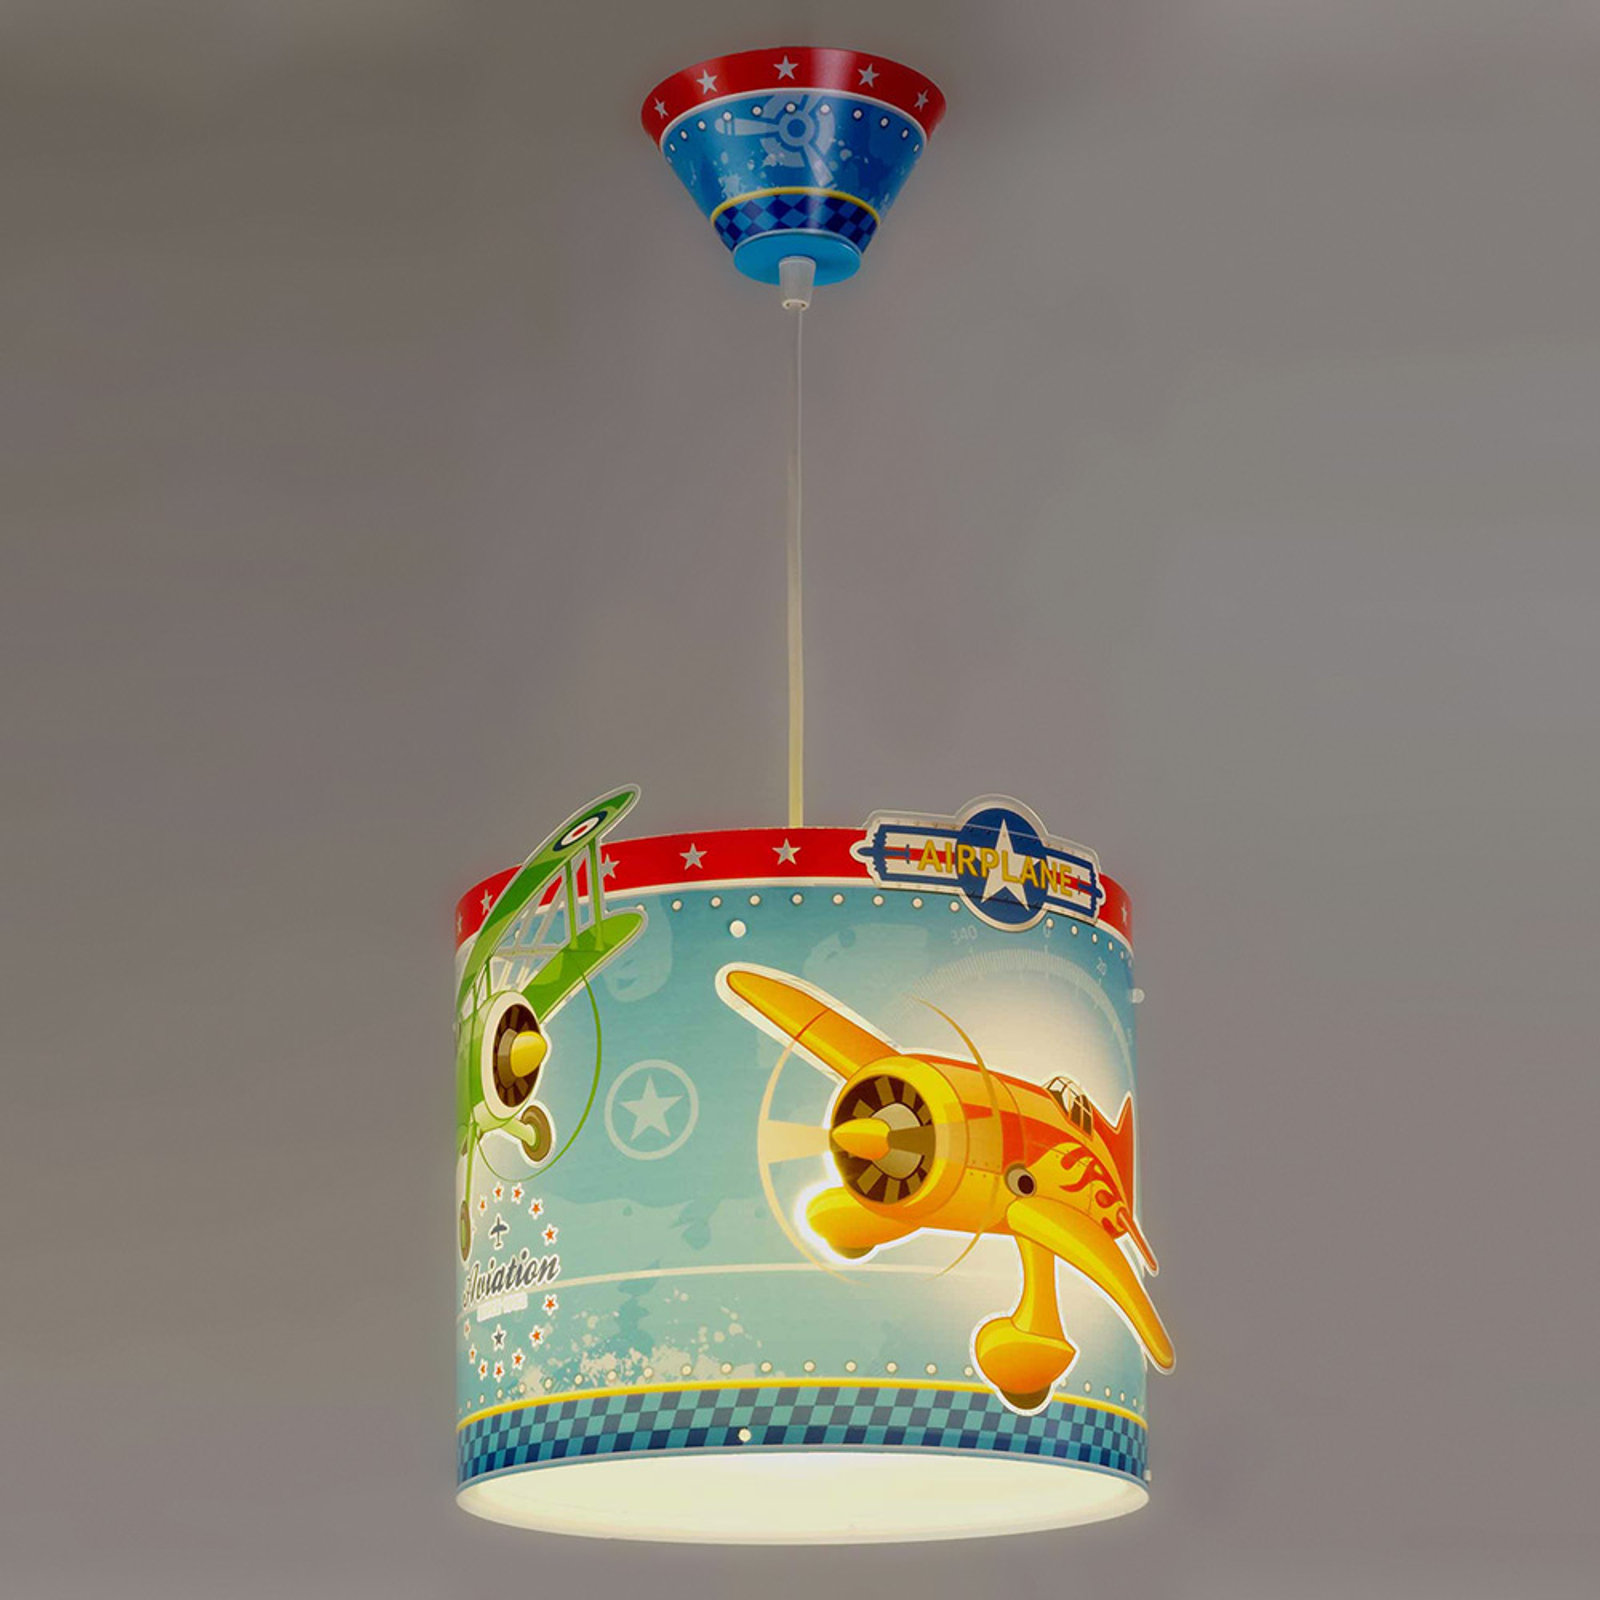 Airplane - taklampa med flygplan